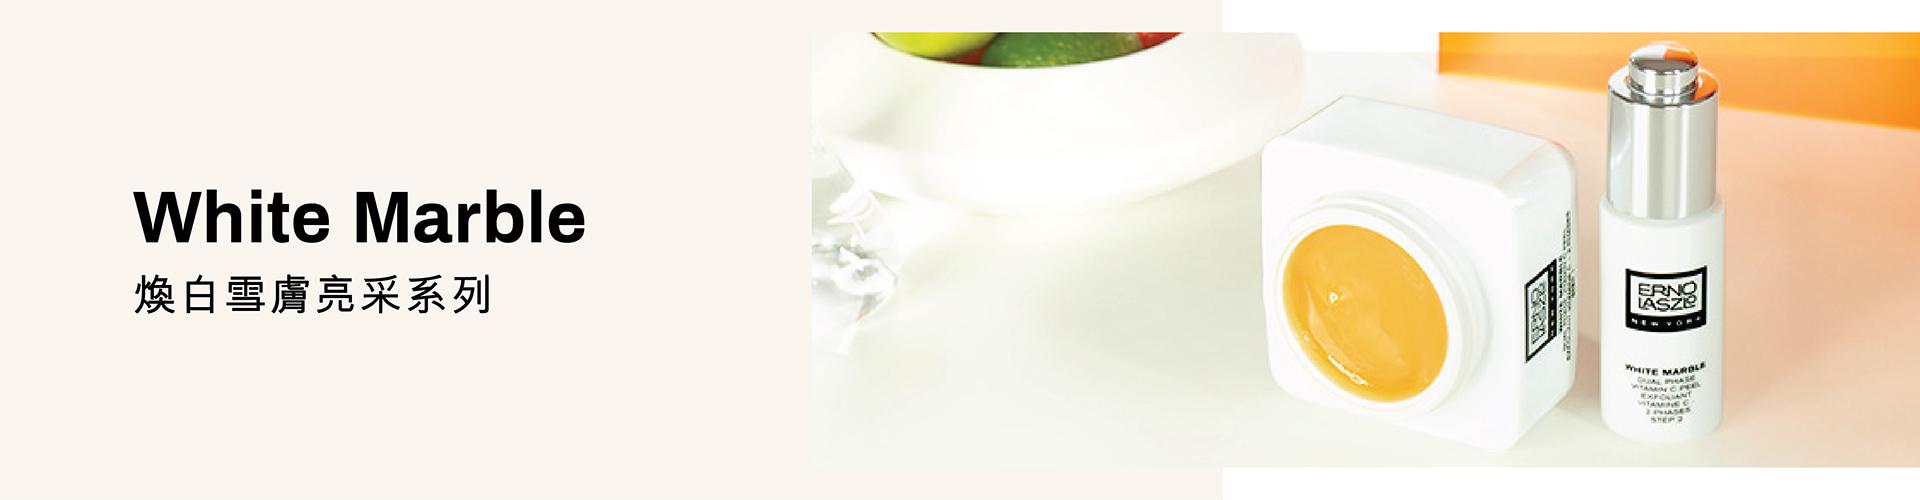 White Marble 煥白雪膚亮采系列